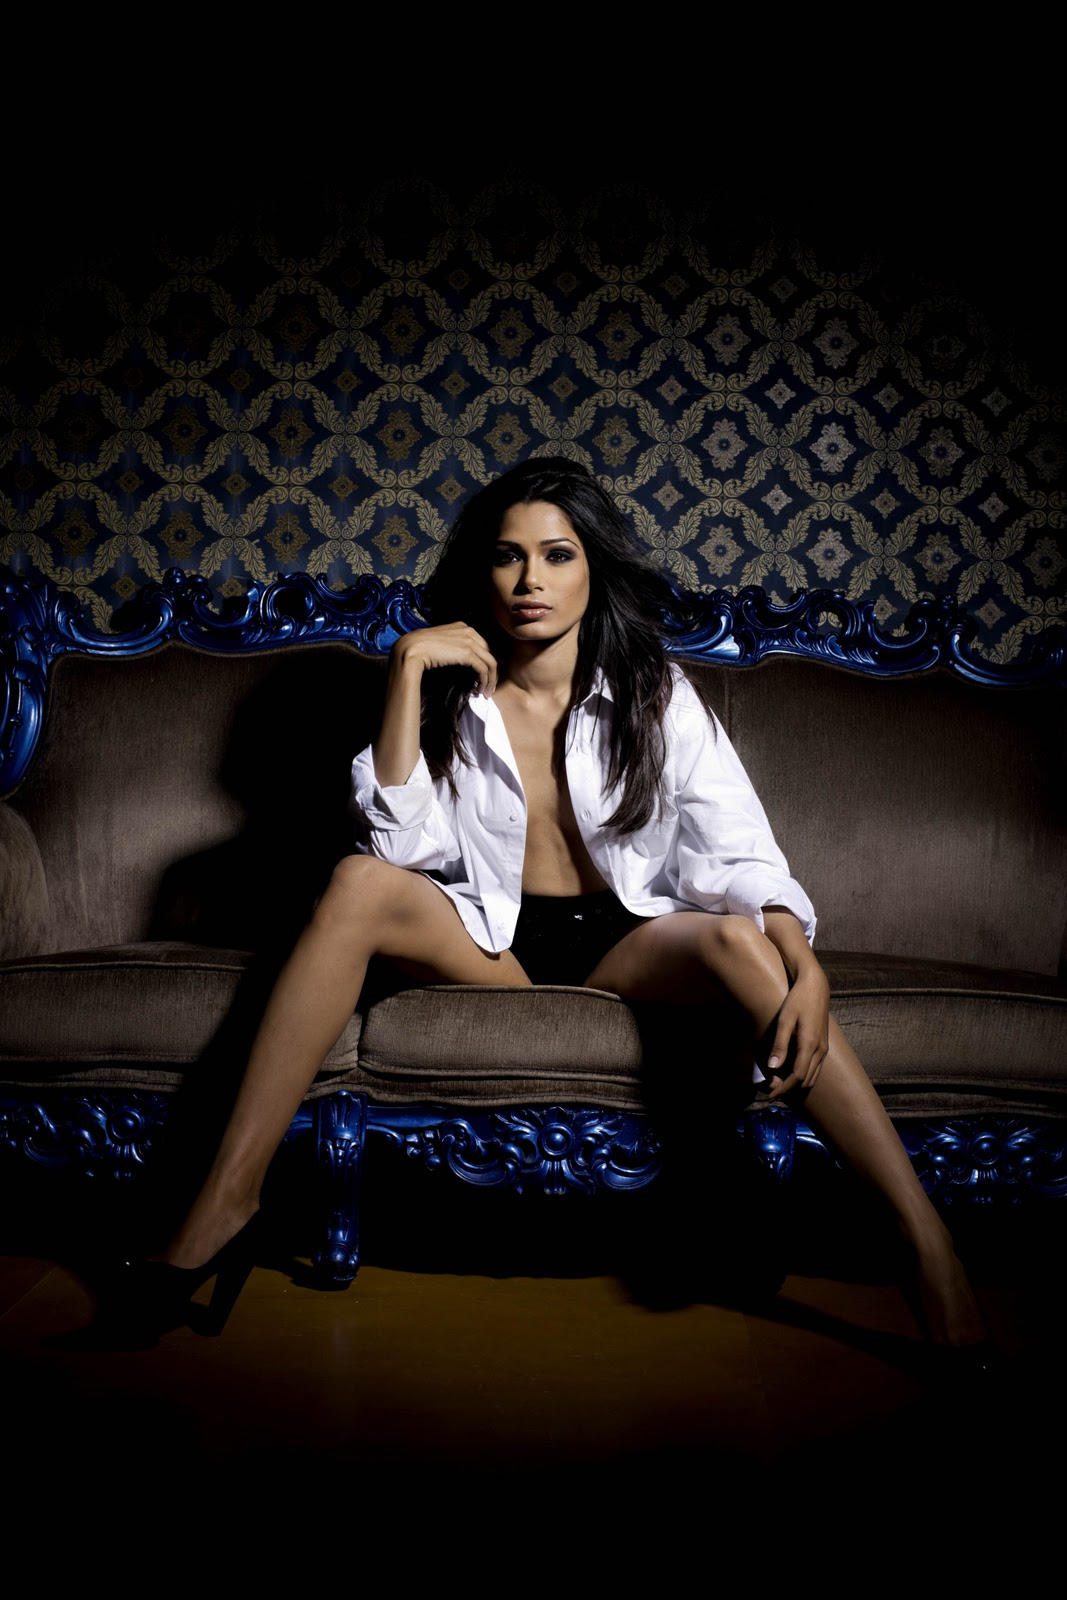 south stylish: 'Freida Pinto' Hot Photo Shoot